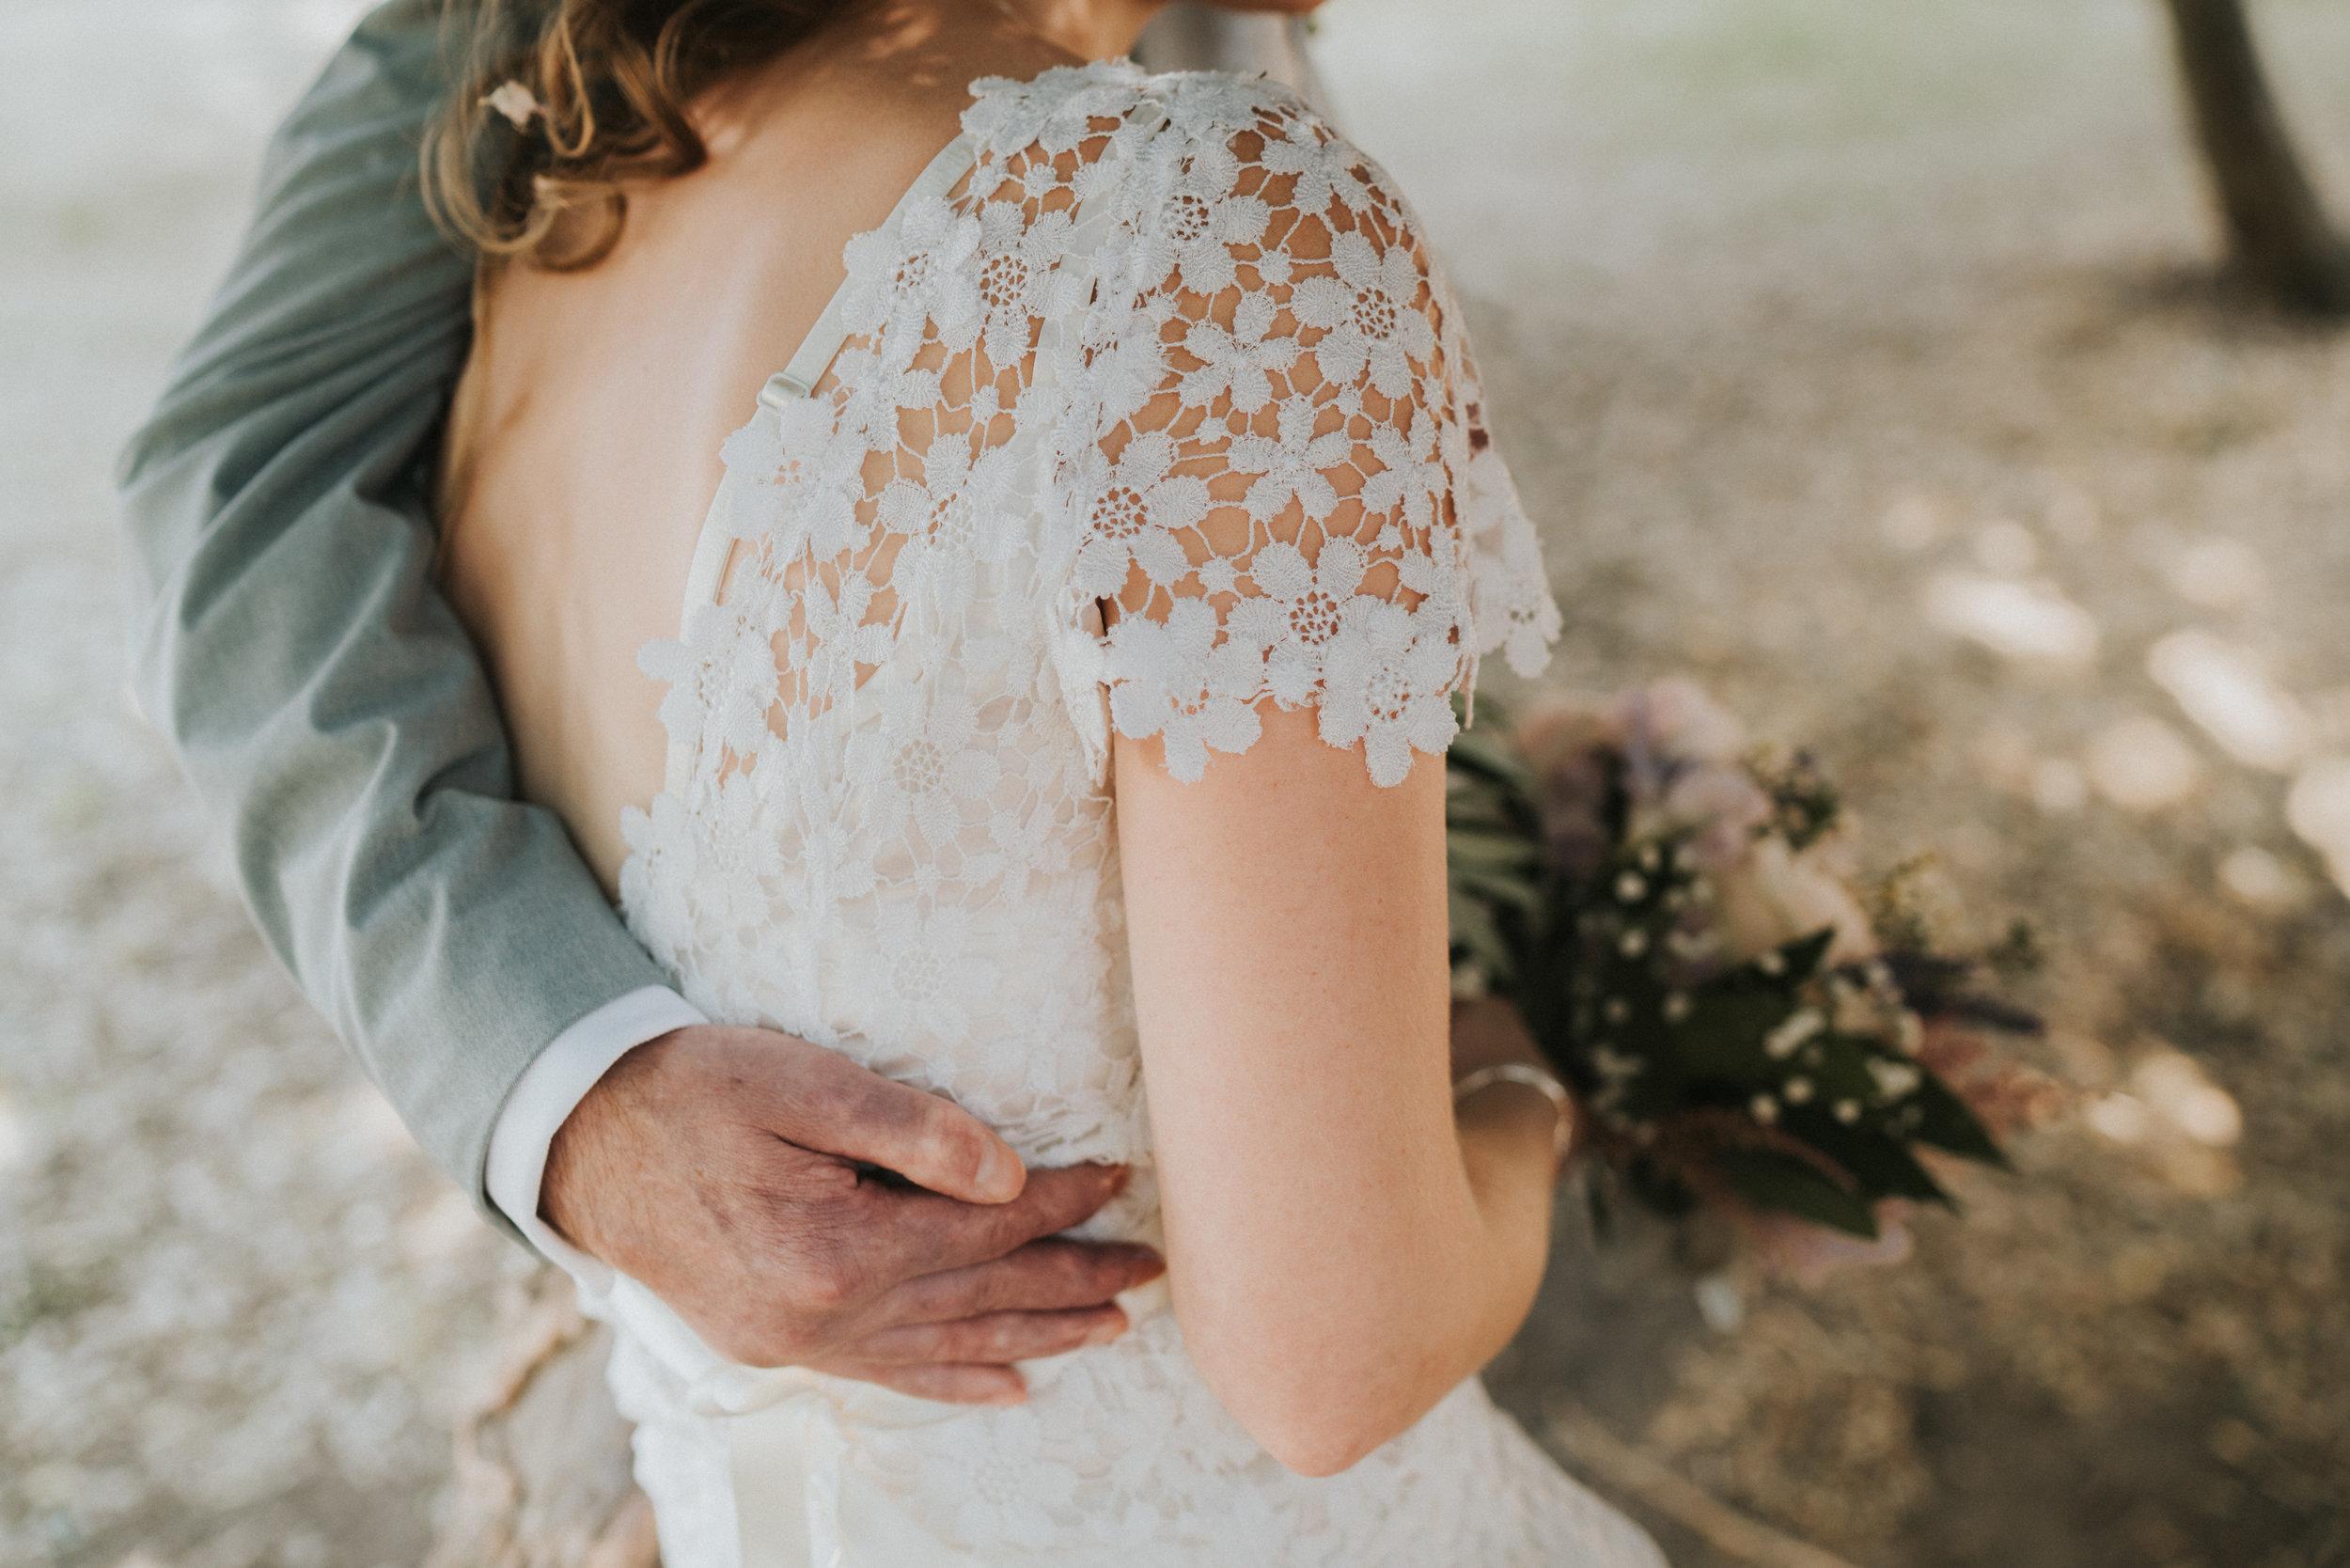 Grace-Elizabeth-Georgie-Amalaketu-Firstsite-Colchester-Essex-Boho-Buddhist-Wedding-Alternative-Wedding-Photography-Essex (90 of 100).jpg